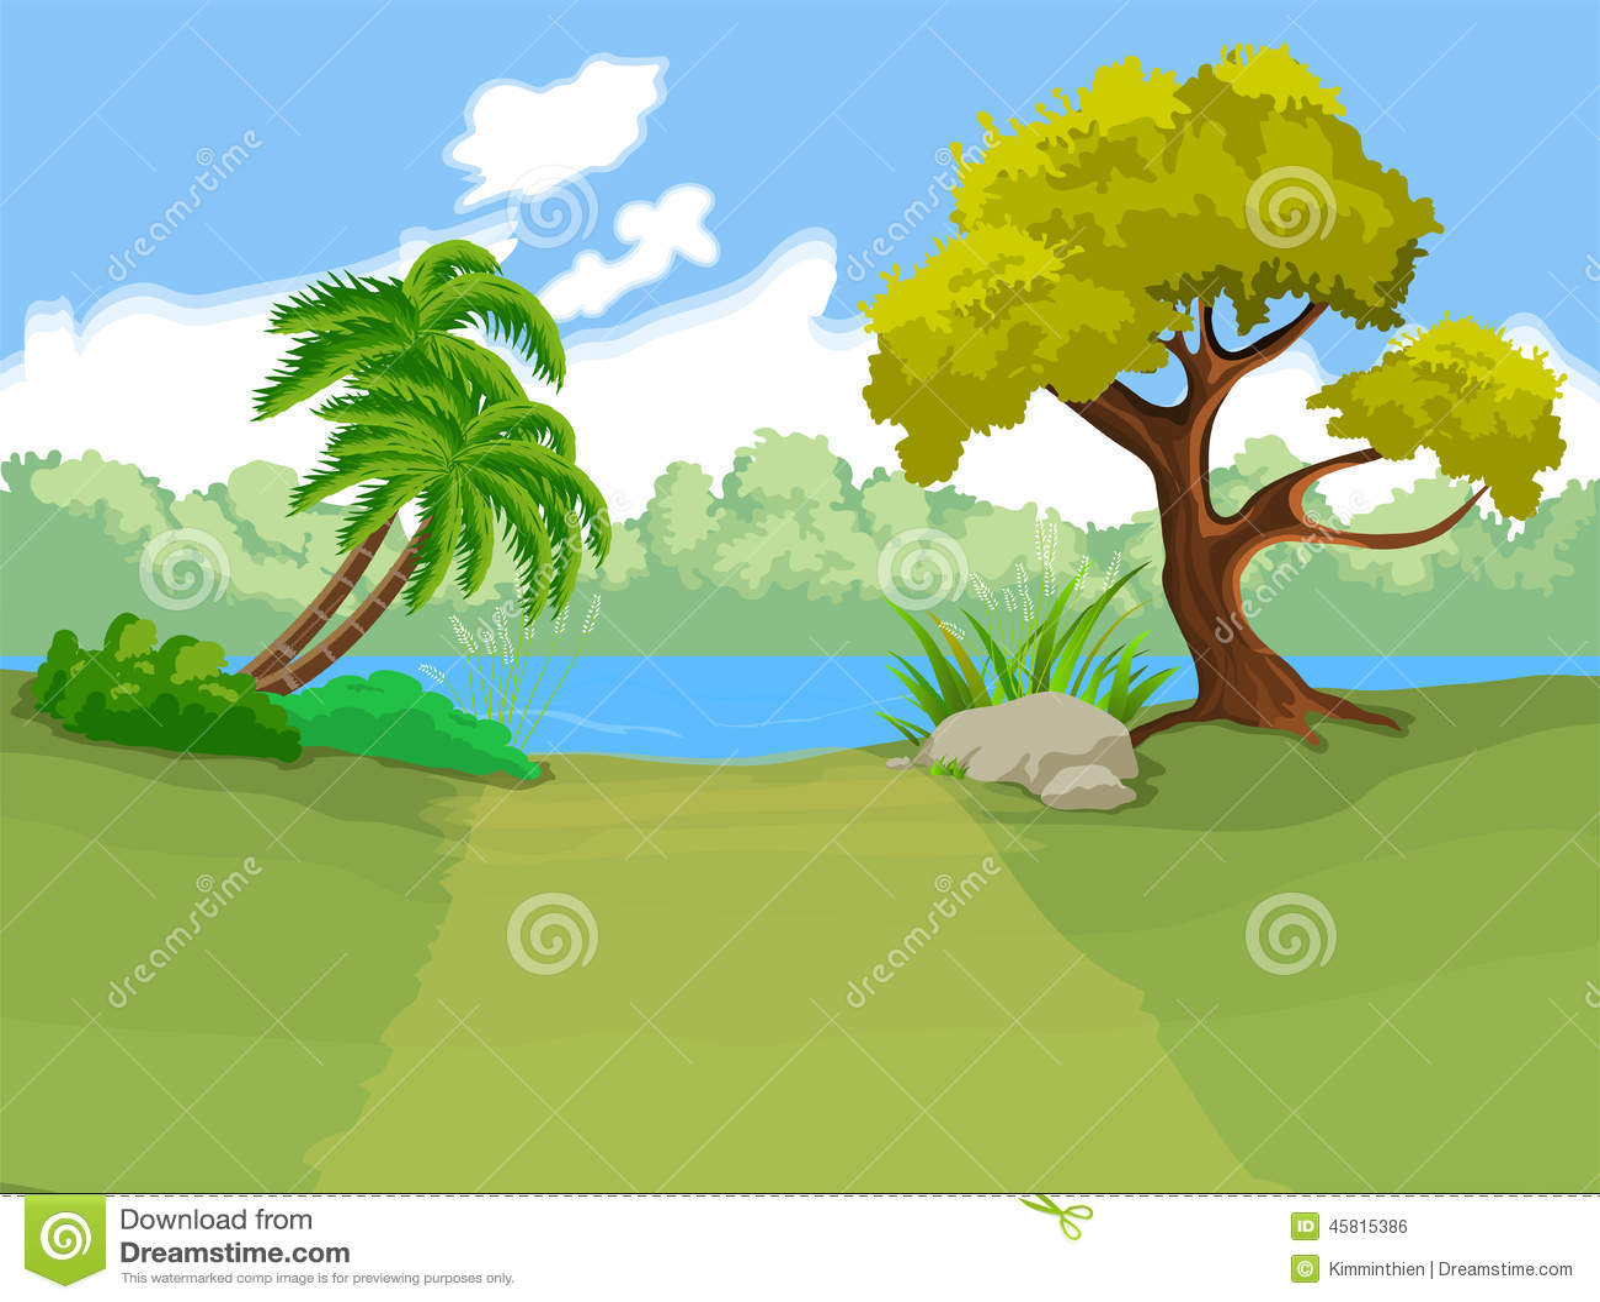 Fondo Animado Campo Parque Full Hd Animate Background: The Natural Landscape Cartoon Background Stock Vector